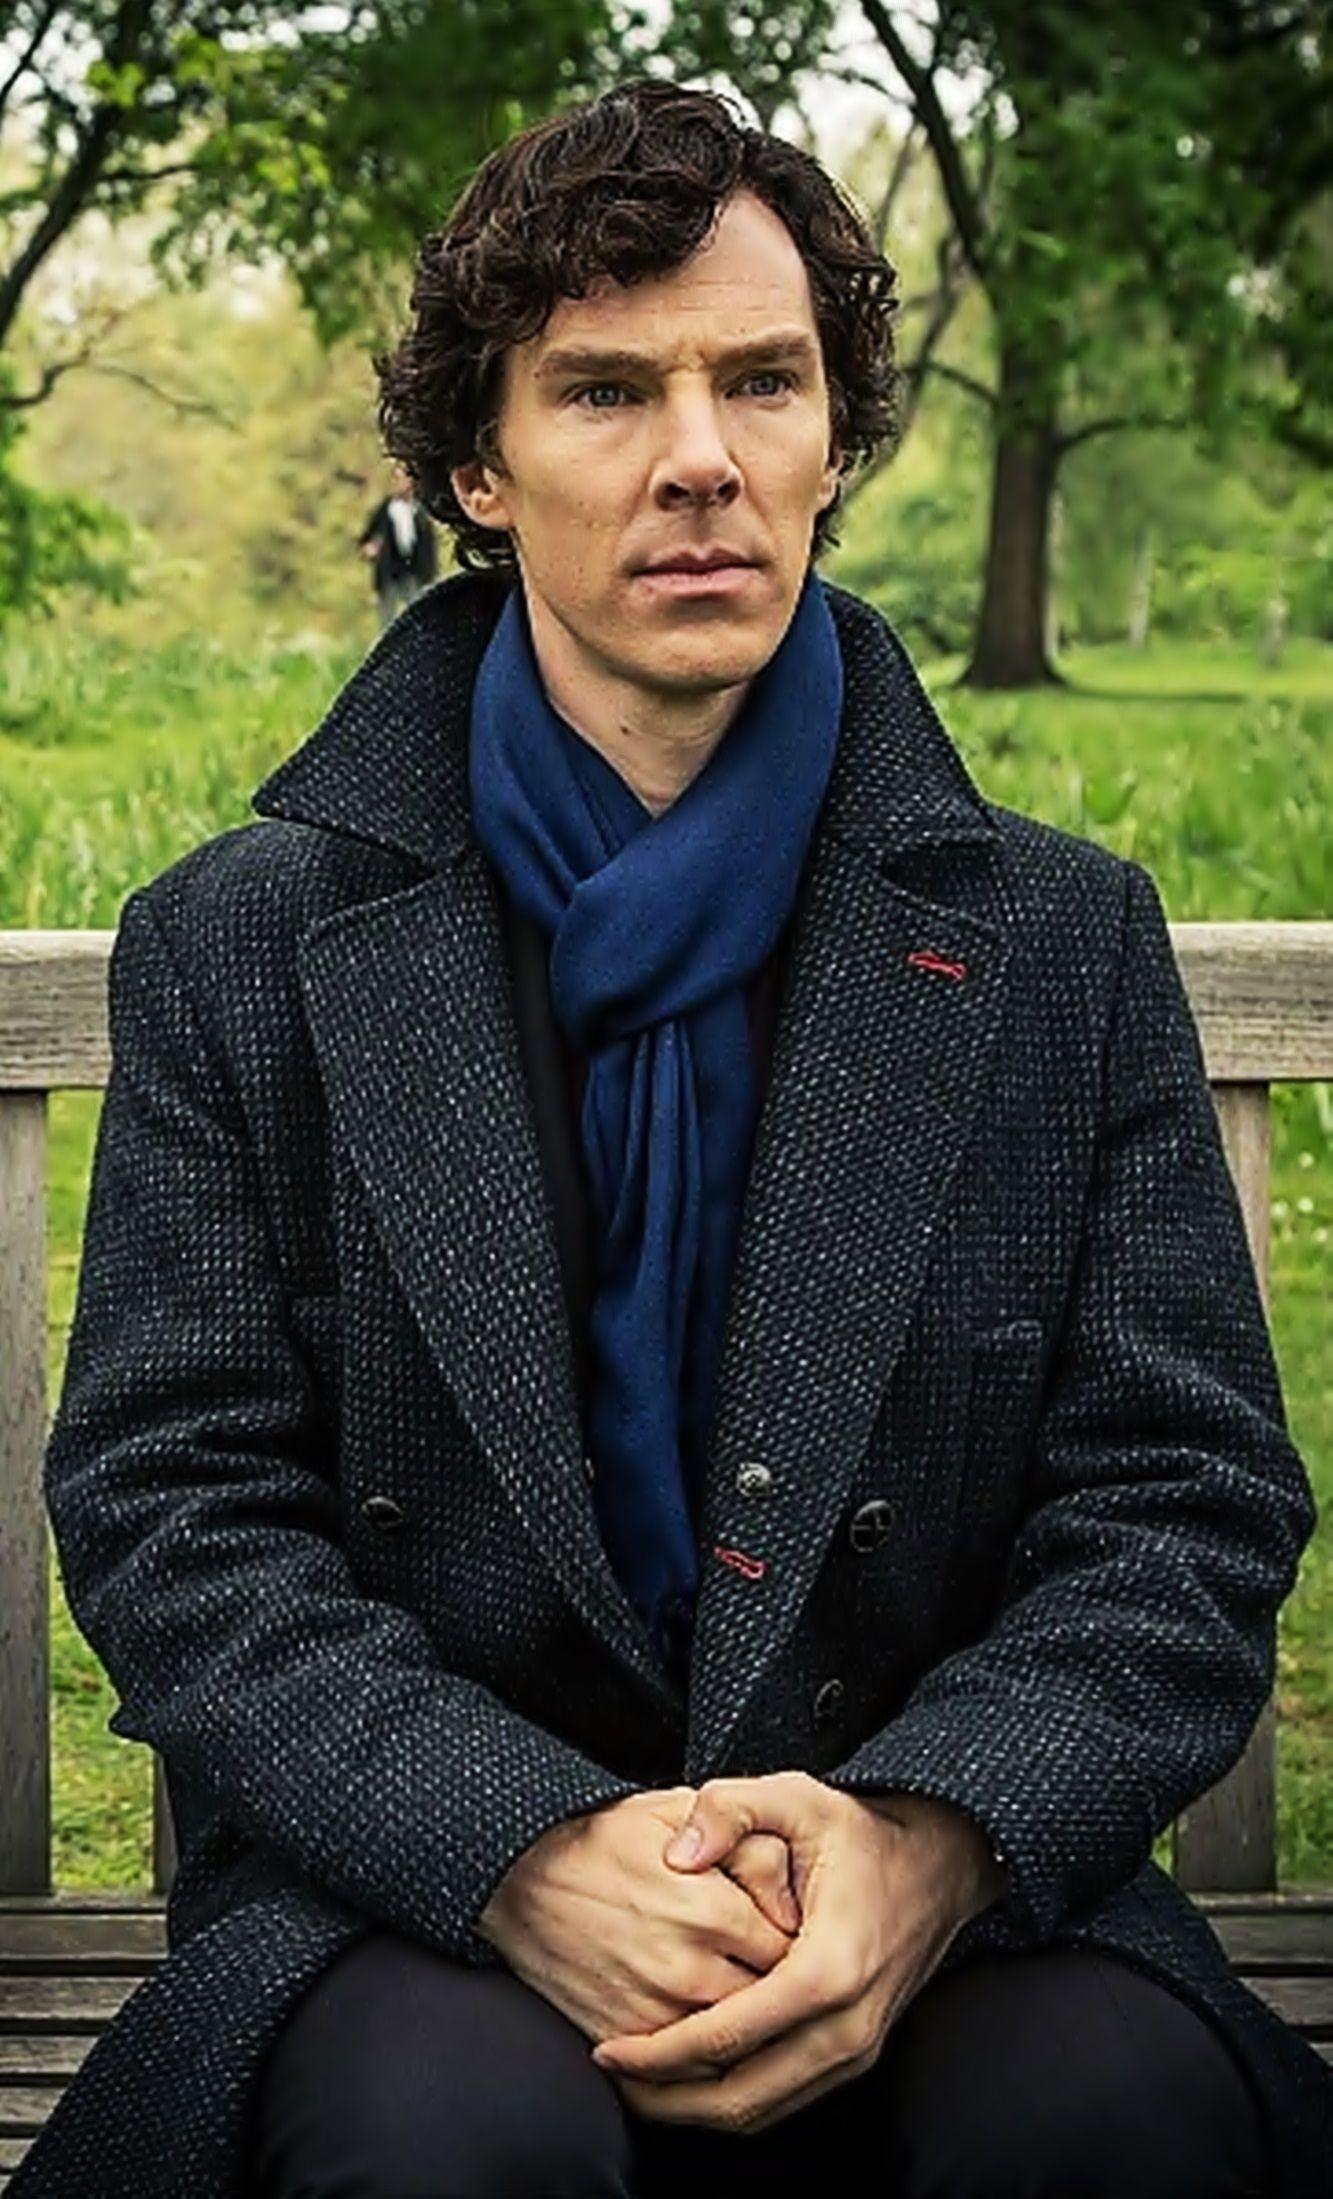 Benedict Cumberbatch as Sherlock.